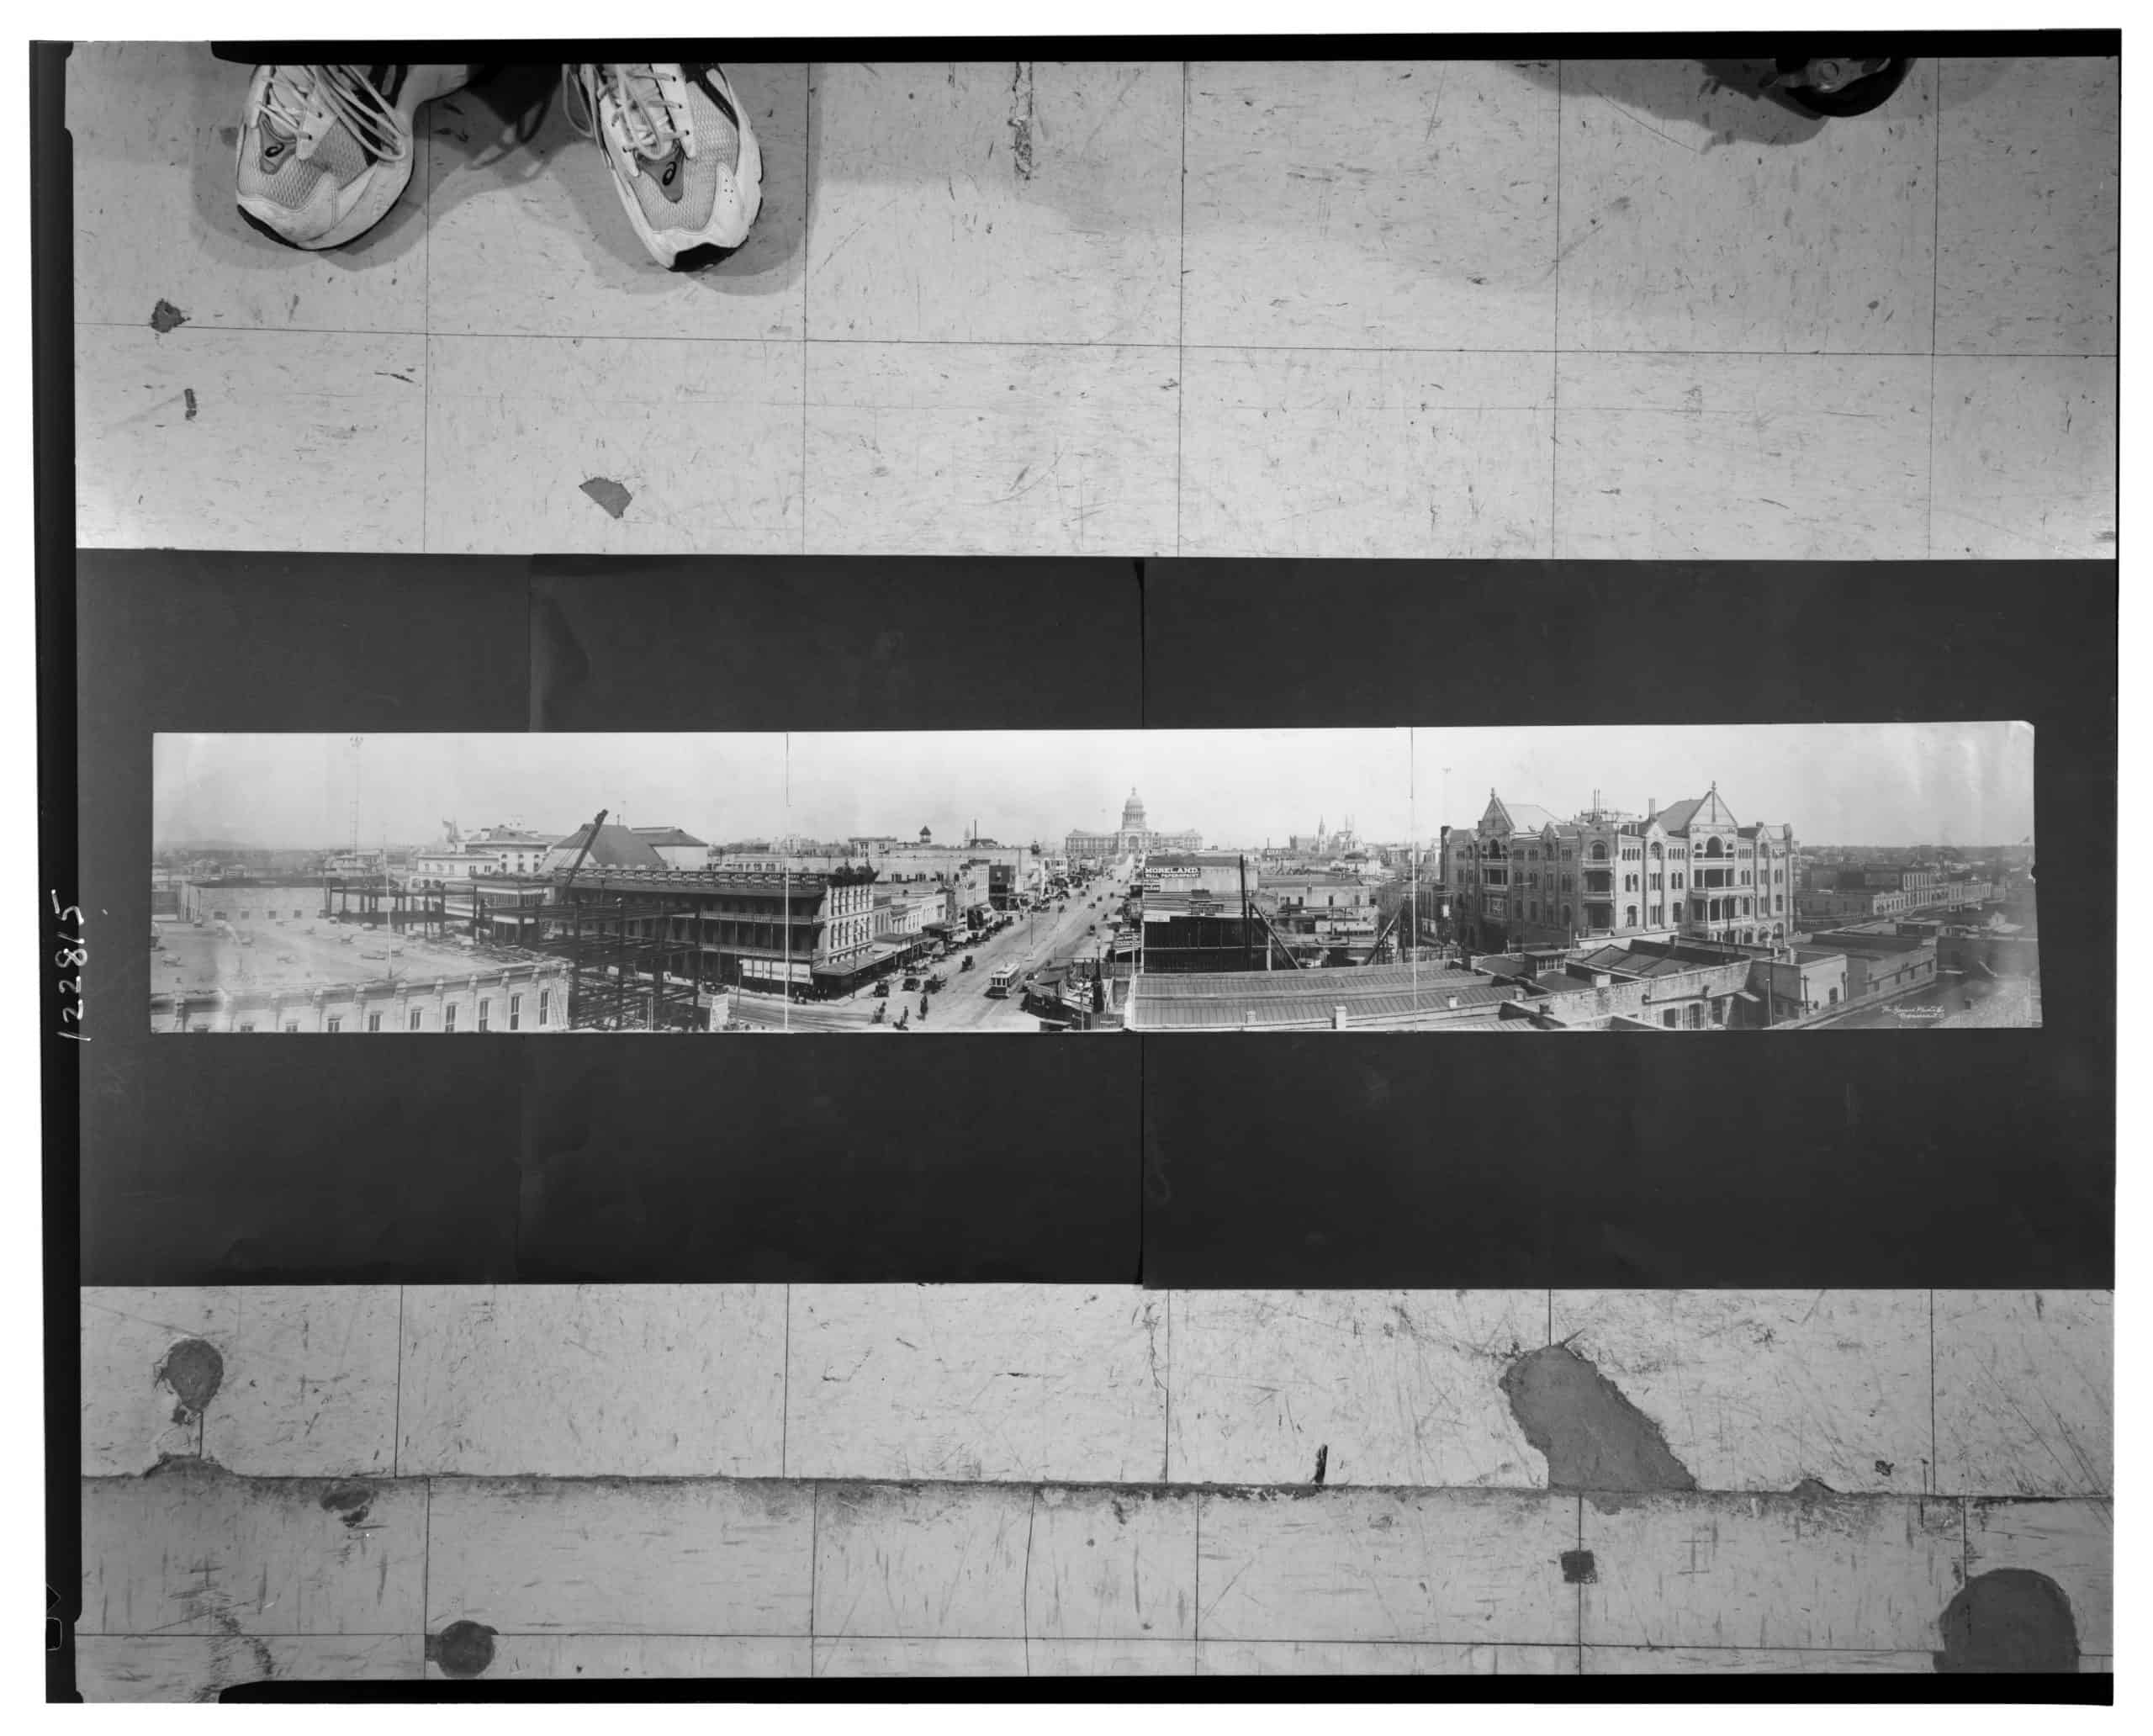 Panorama Austin, Texas, Haines Photo Co., ca 1910